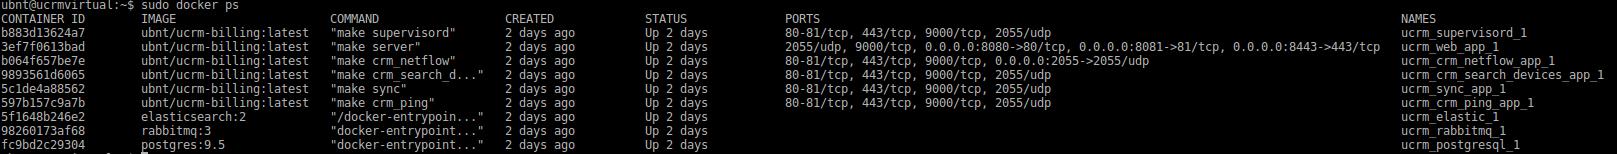 Random UCRM server outages | Ubiquiti Community